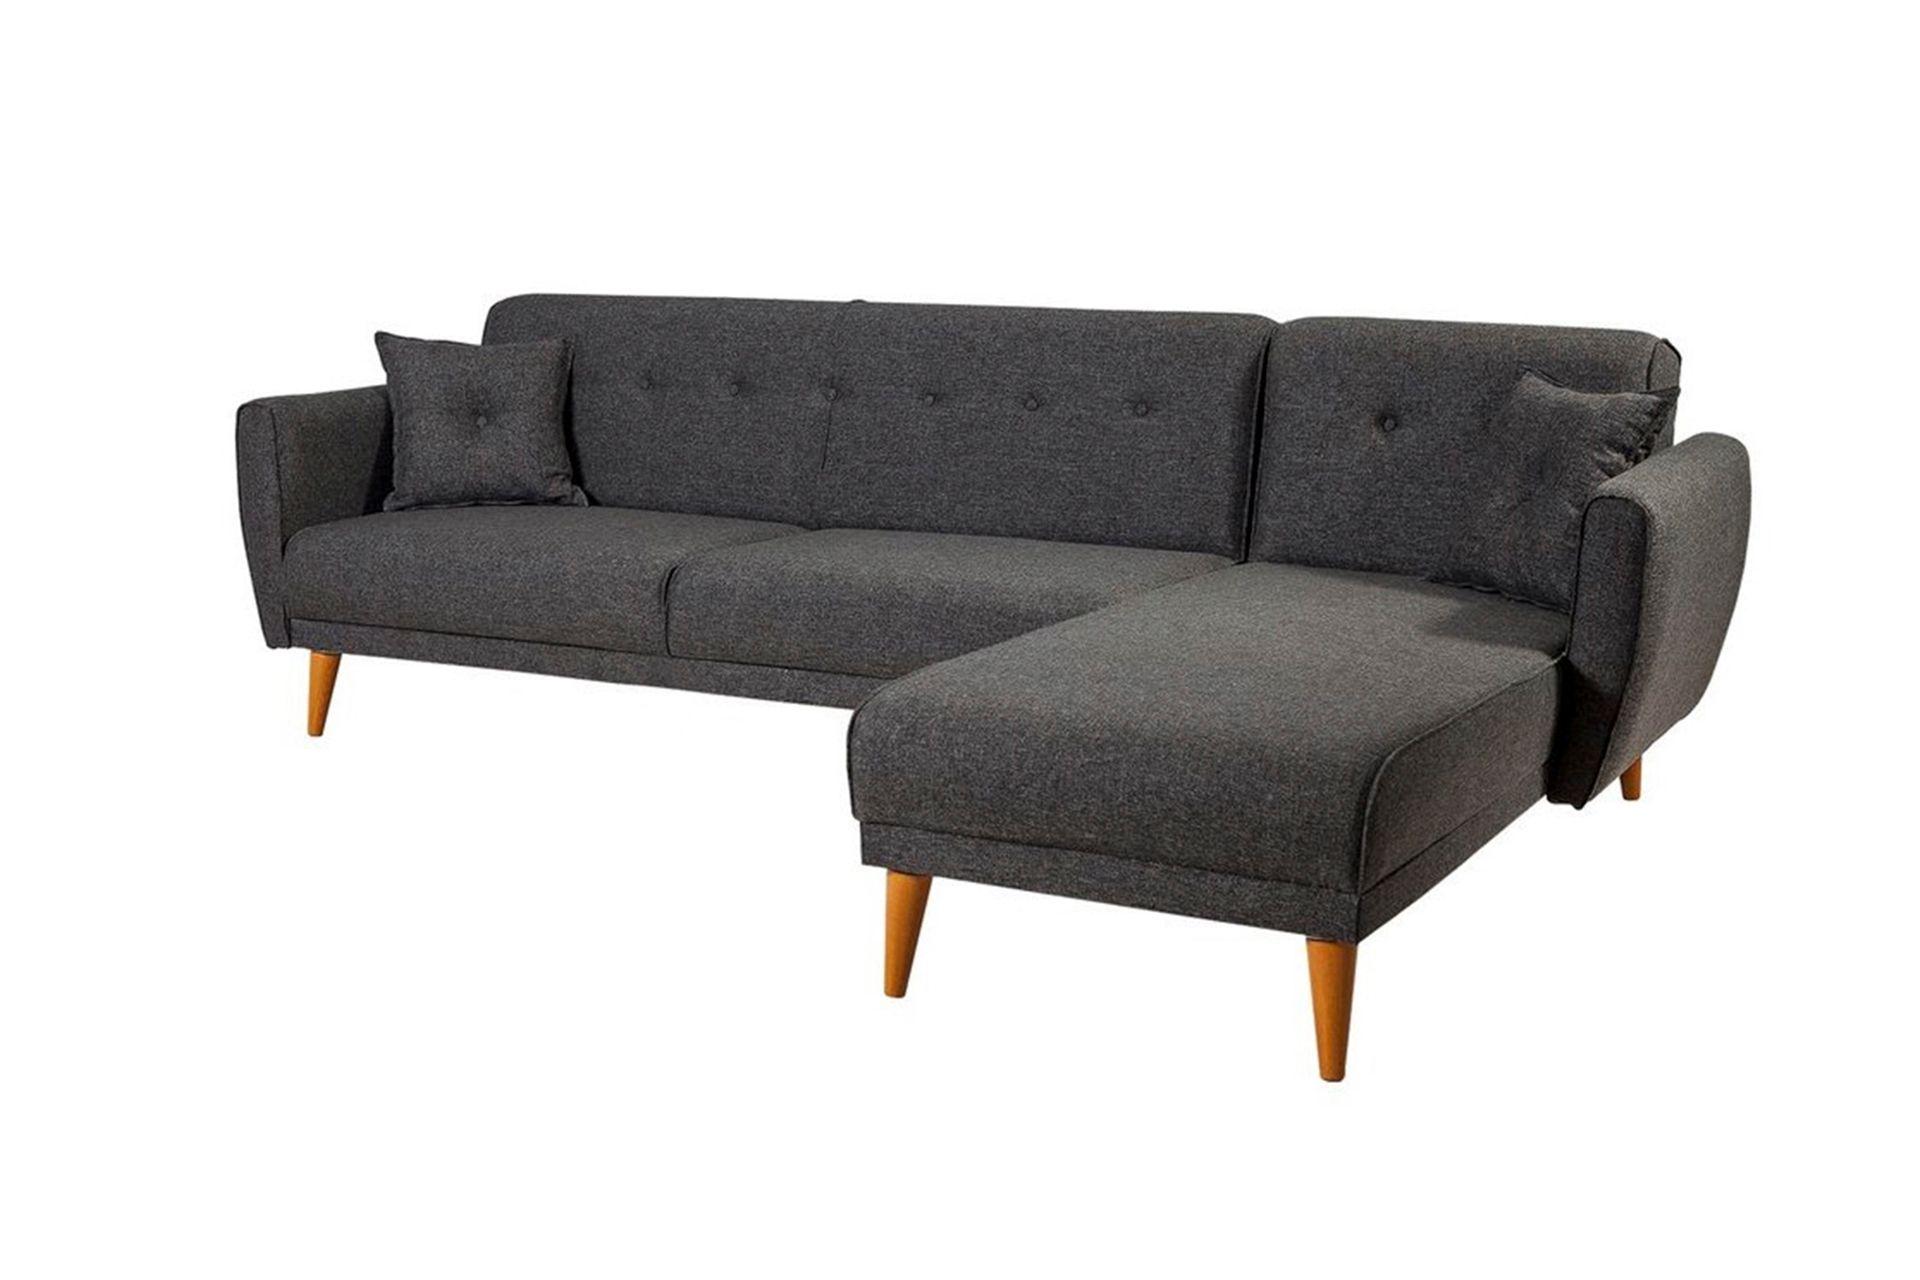 Aria Corner Sofa Bed, Anthracite Grey (Right)